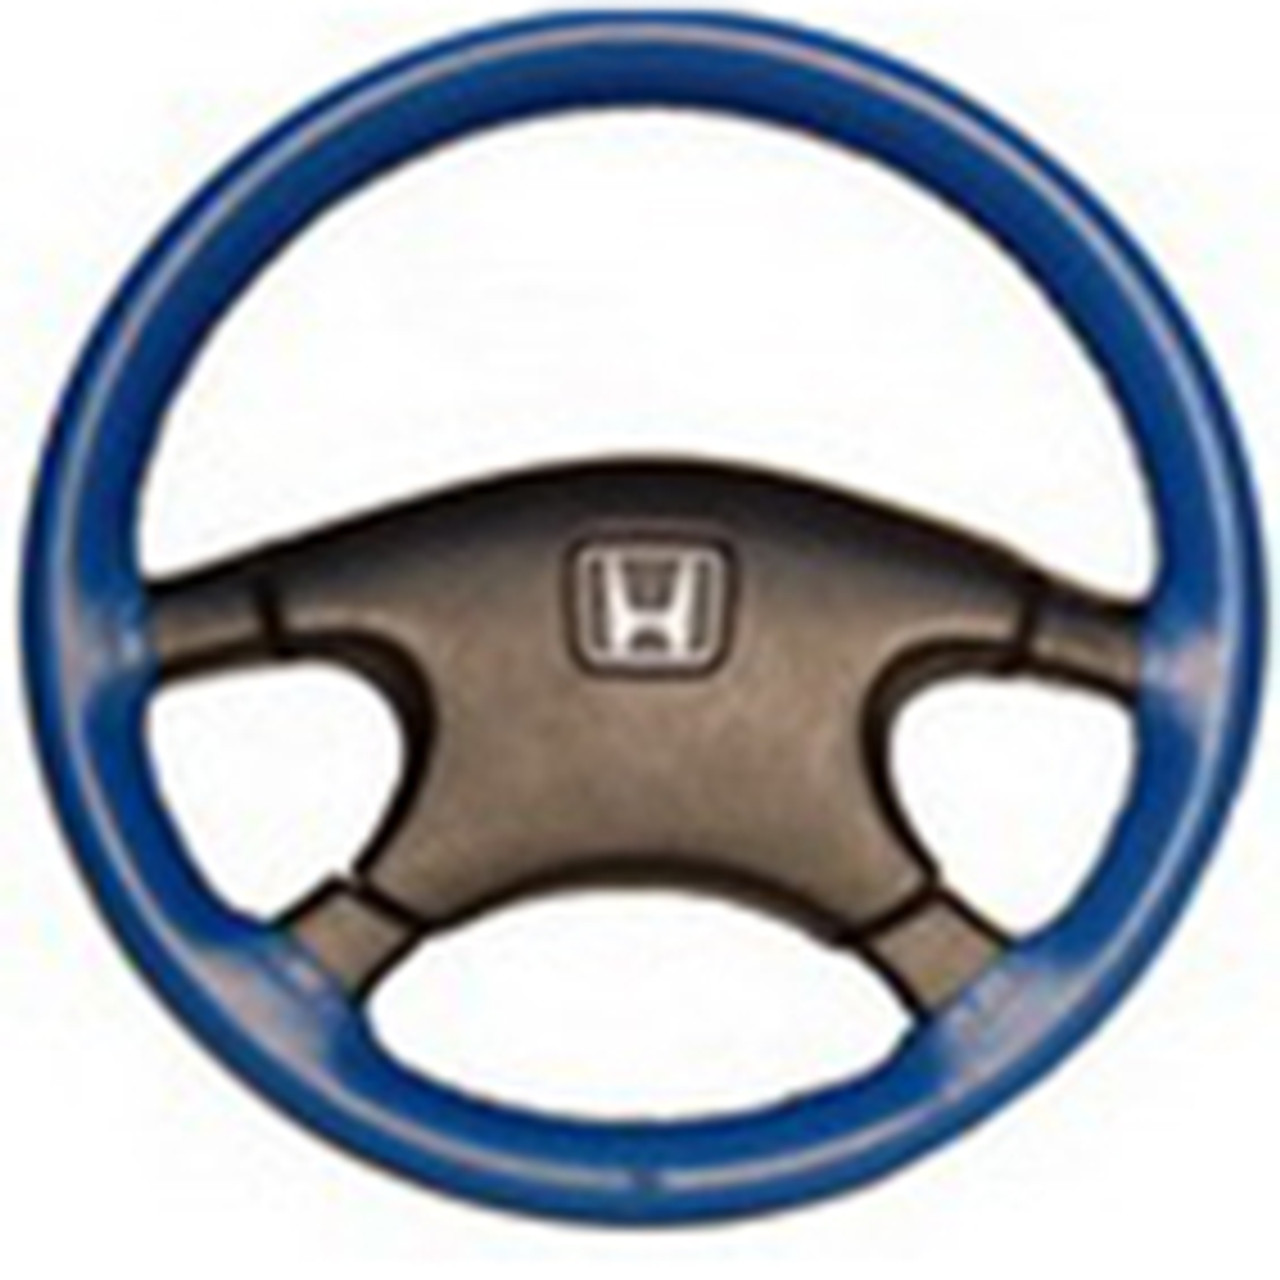 Acura TLX Original Original WheelSkin Steering Wheel Cover - Acura steering wheel cover